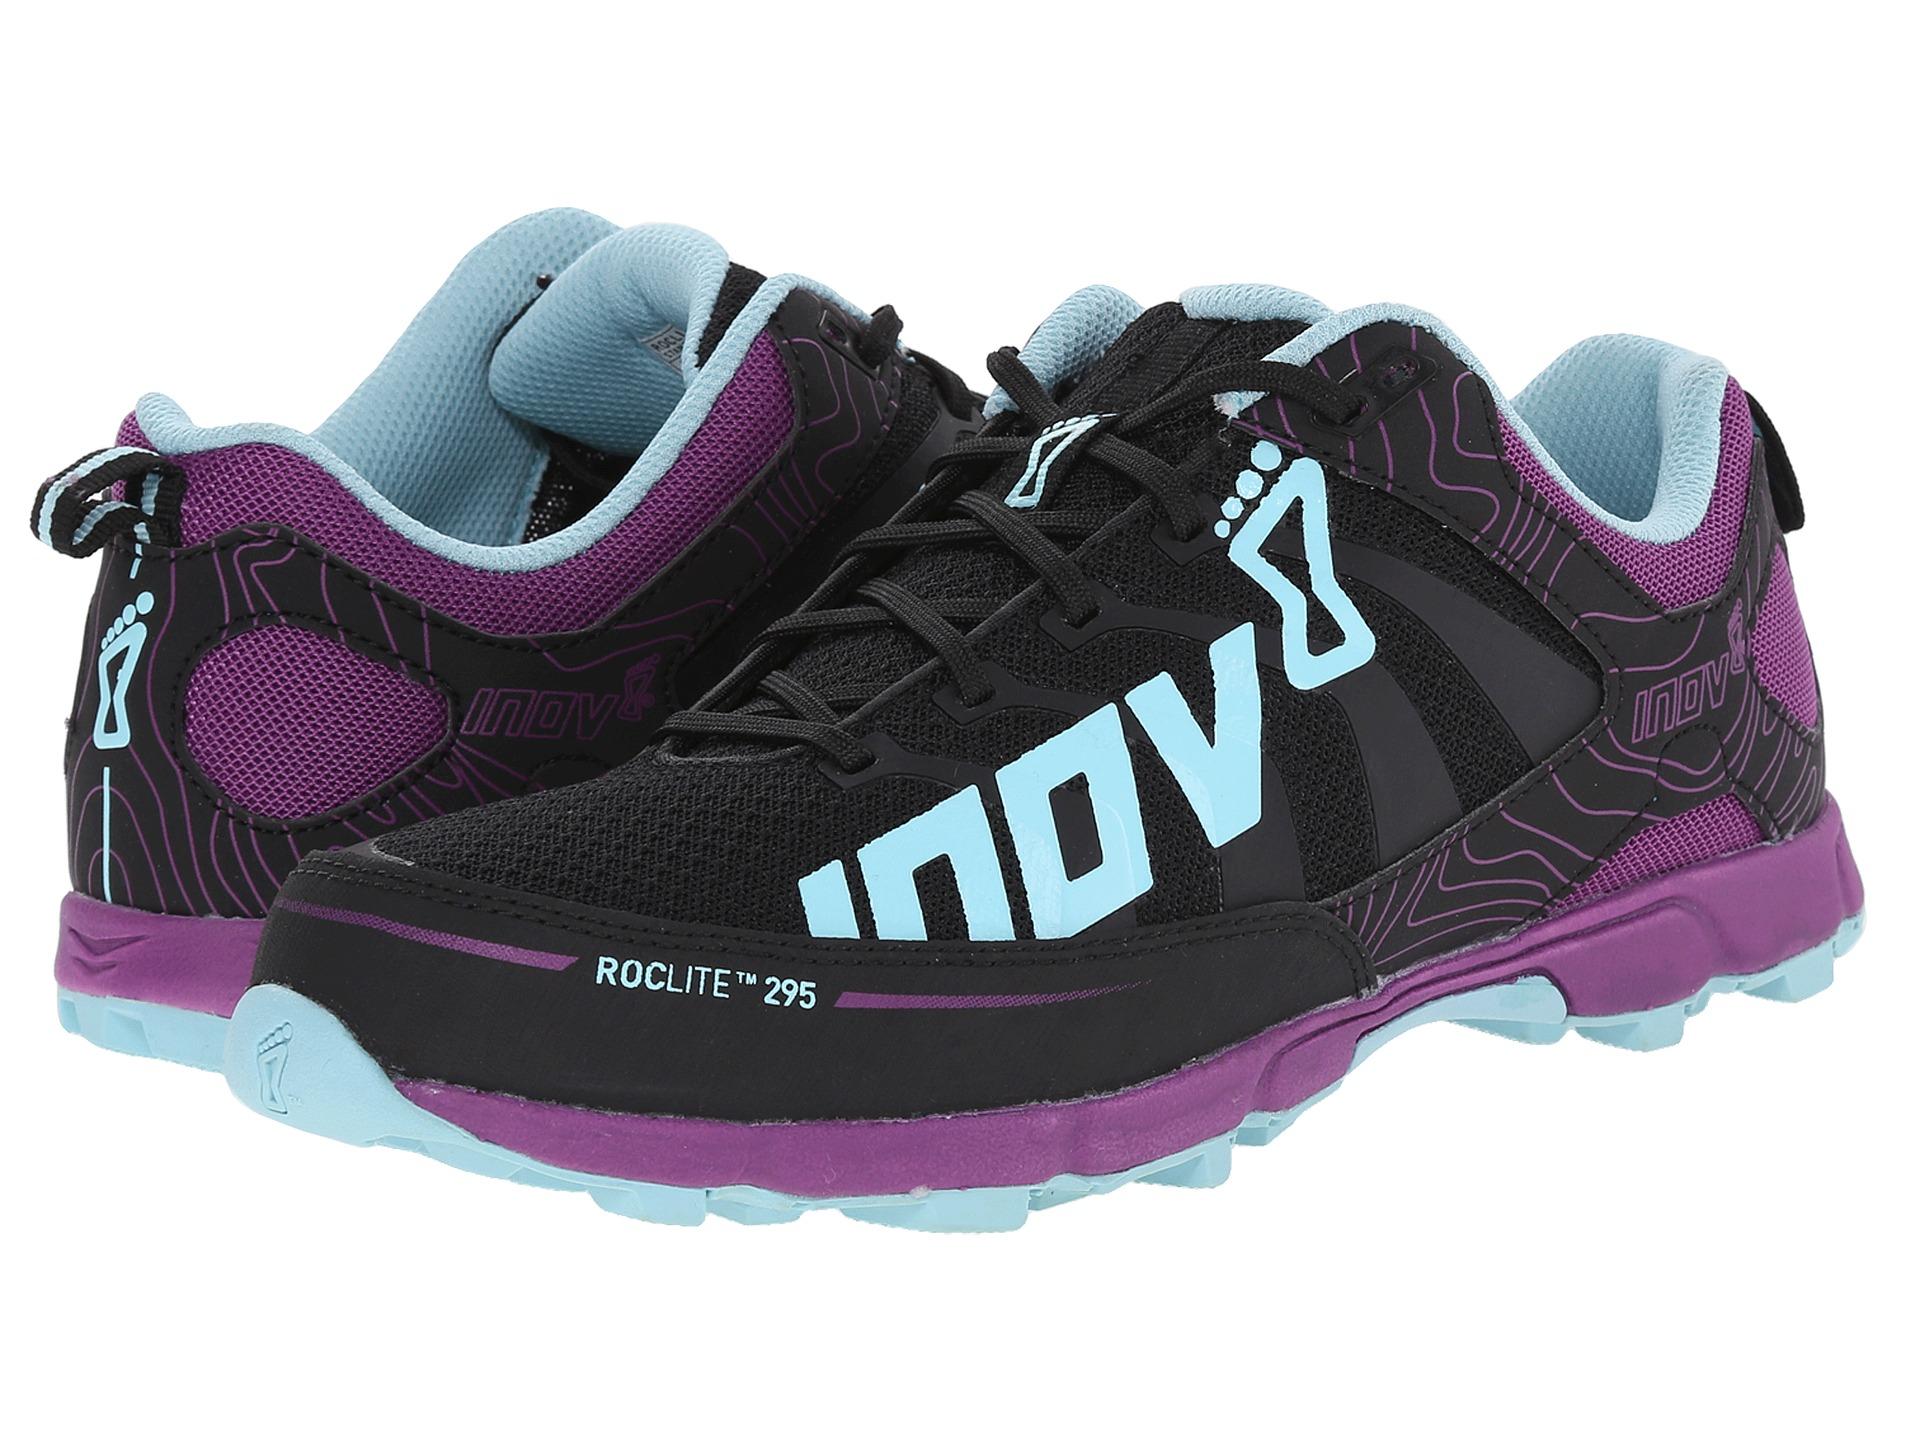 BlueShoesWomen Roclite Purple Inov On 295 8 Grey Popscreen 1FKTlJc